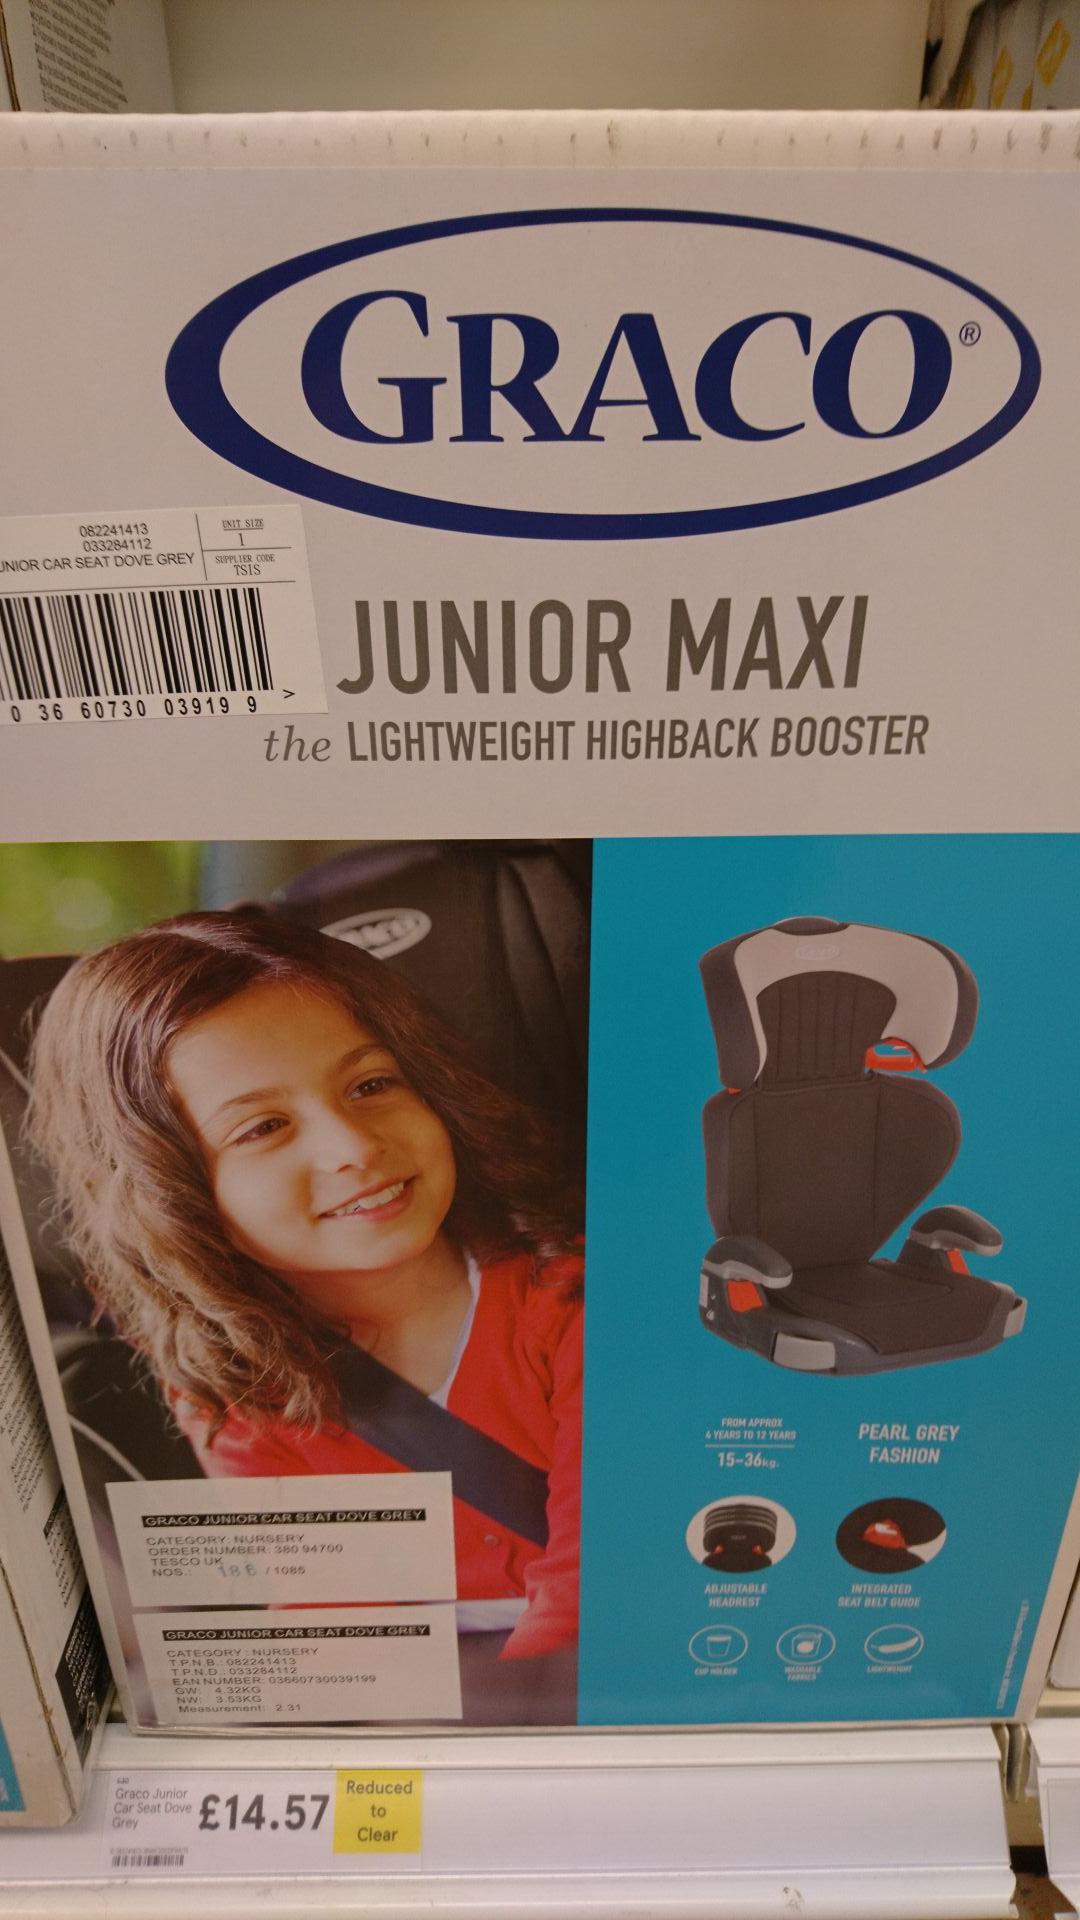 Graco Junior maxi highback booster seat £14.57 instore @ tesco